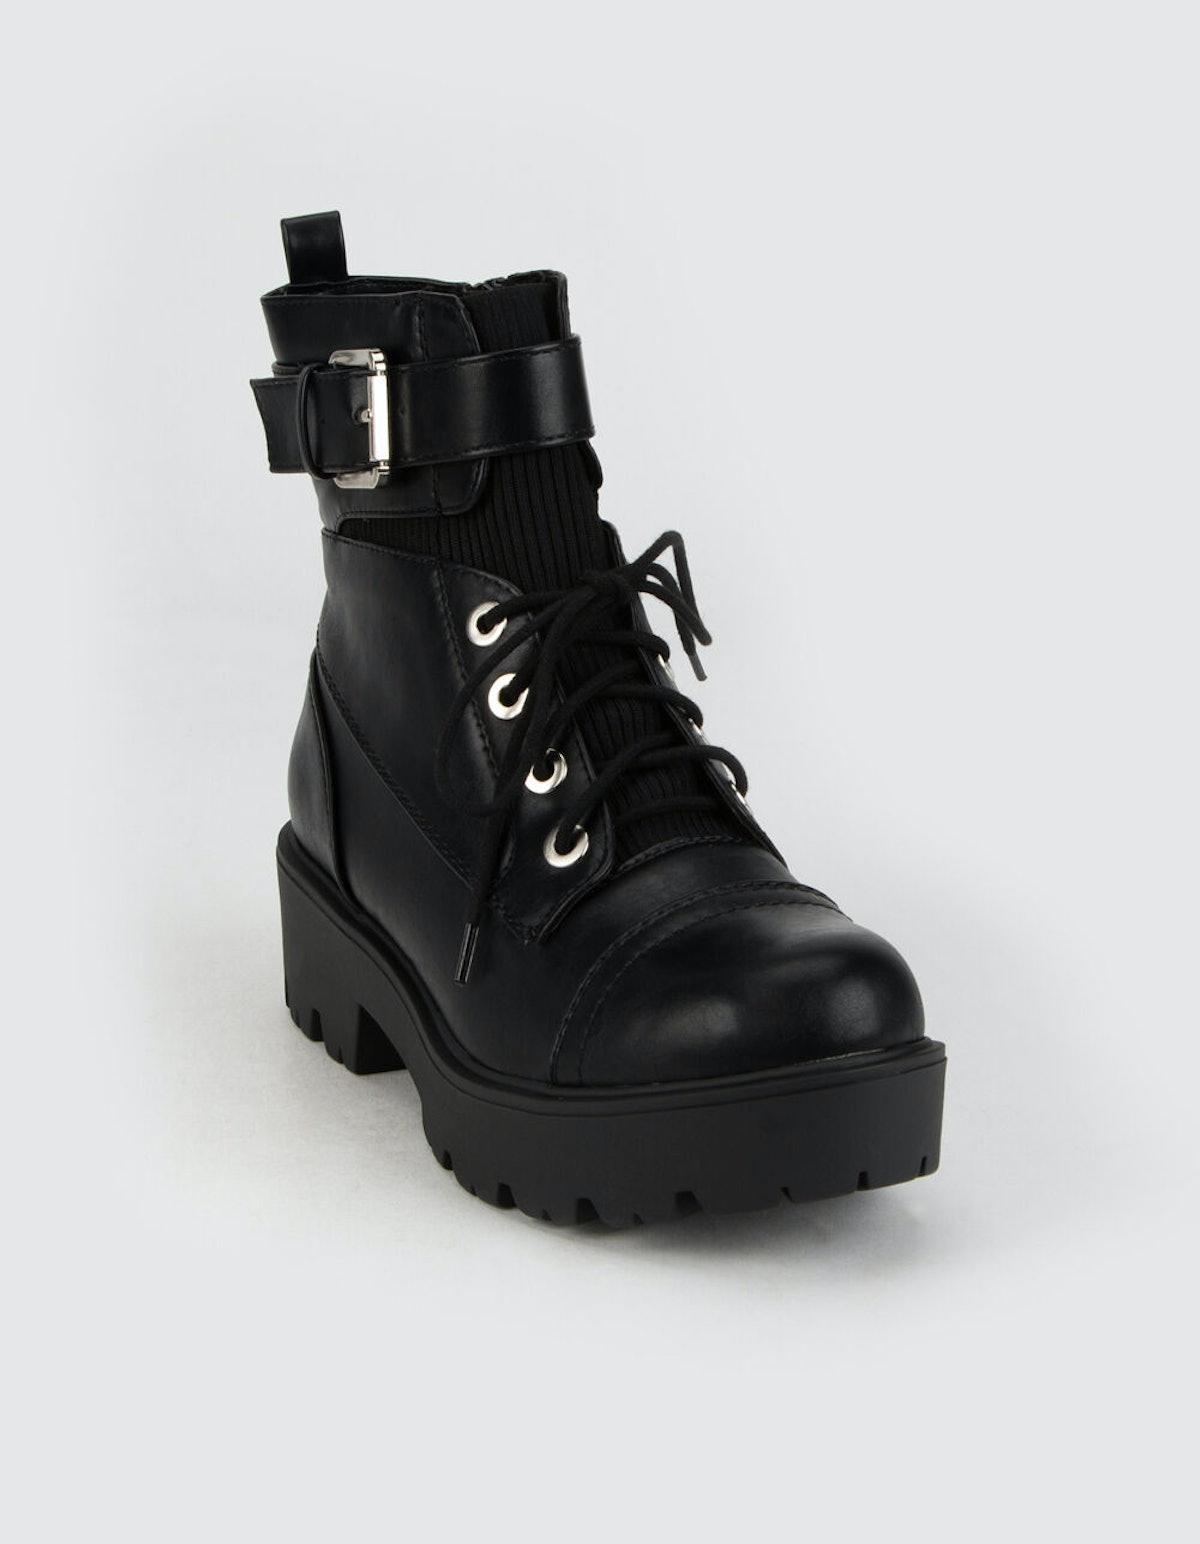 SODA Lug Buckle Womens Combat Boots